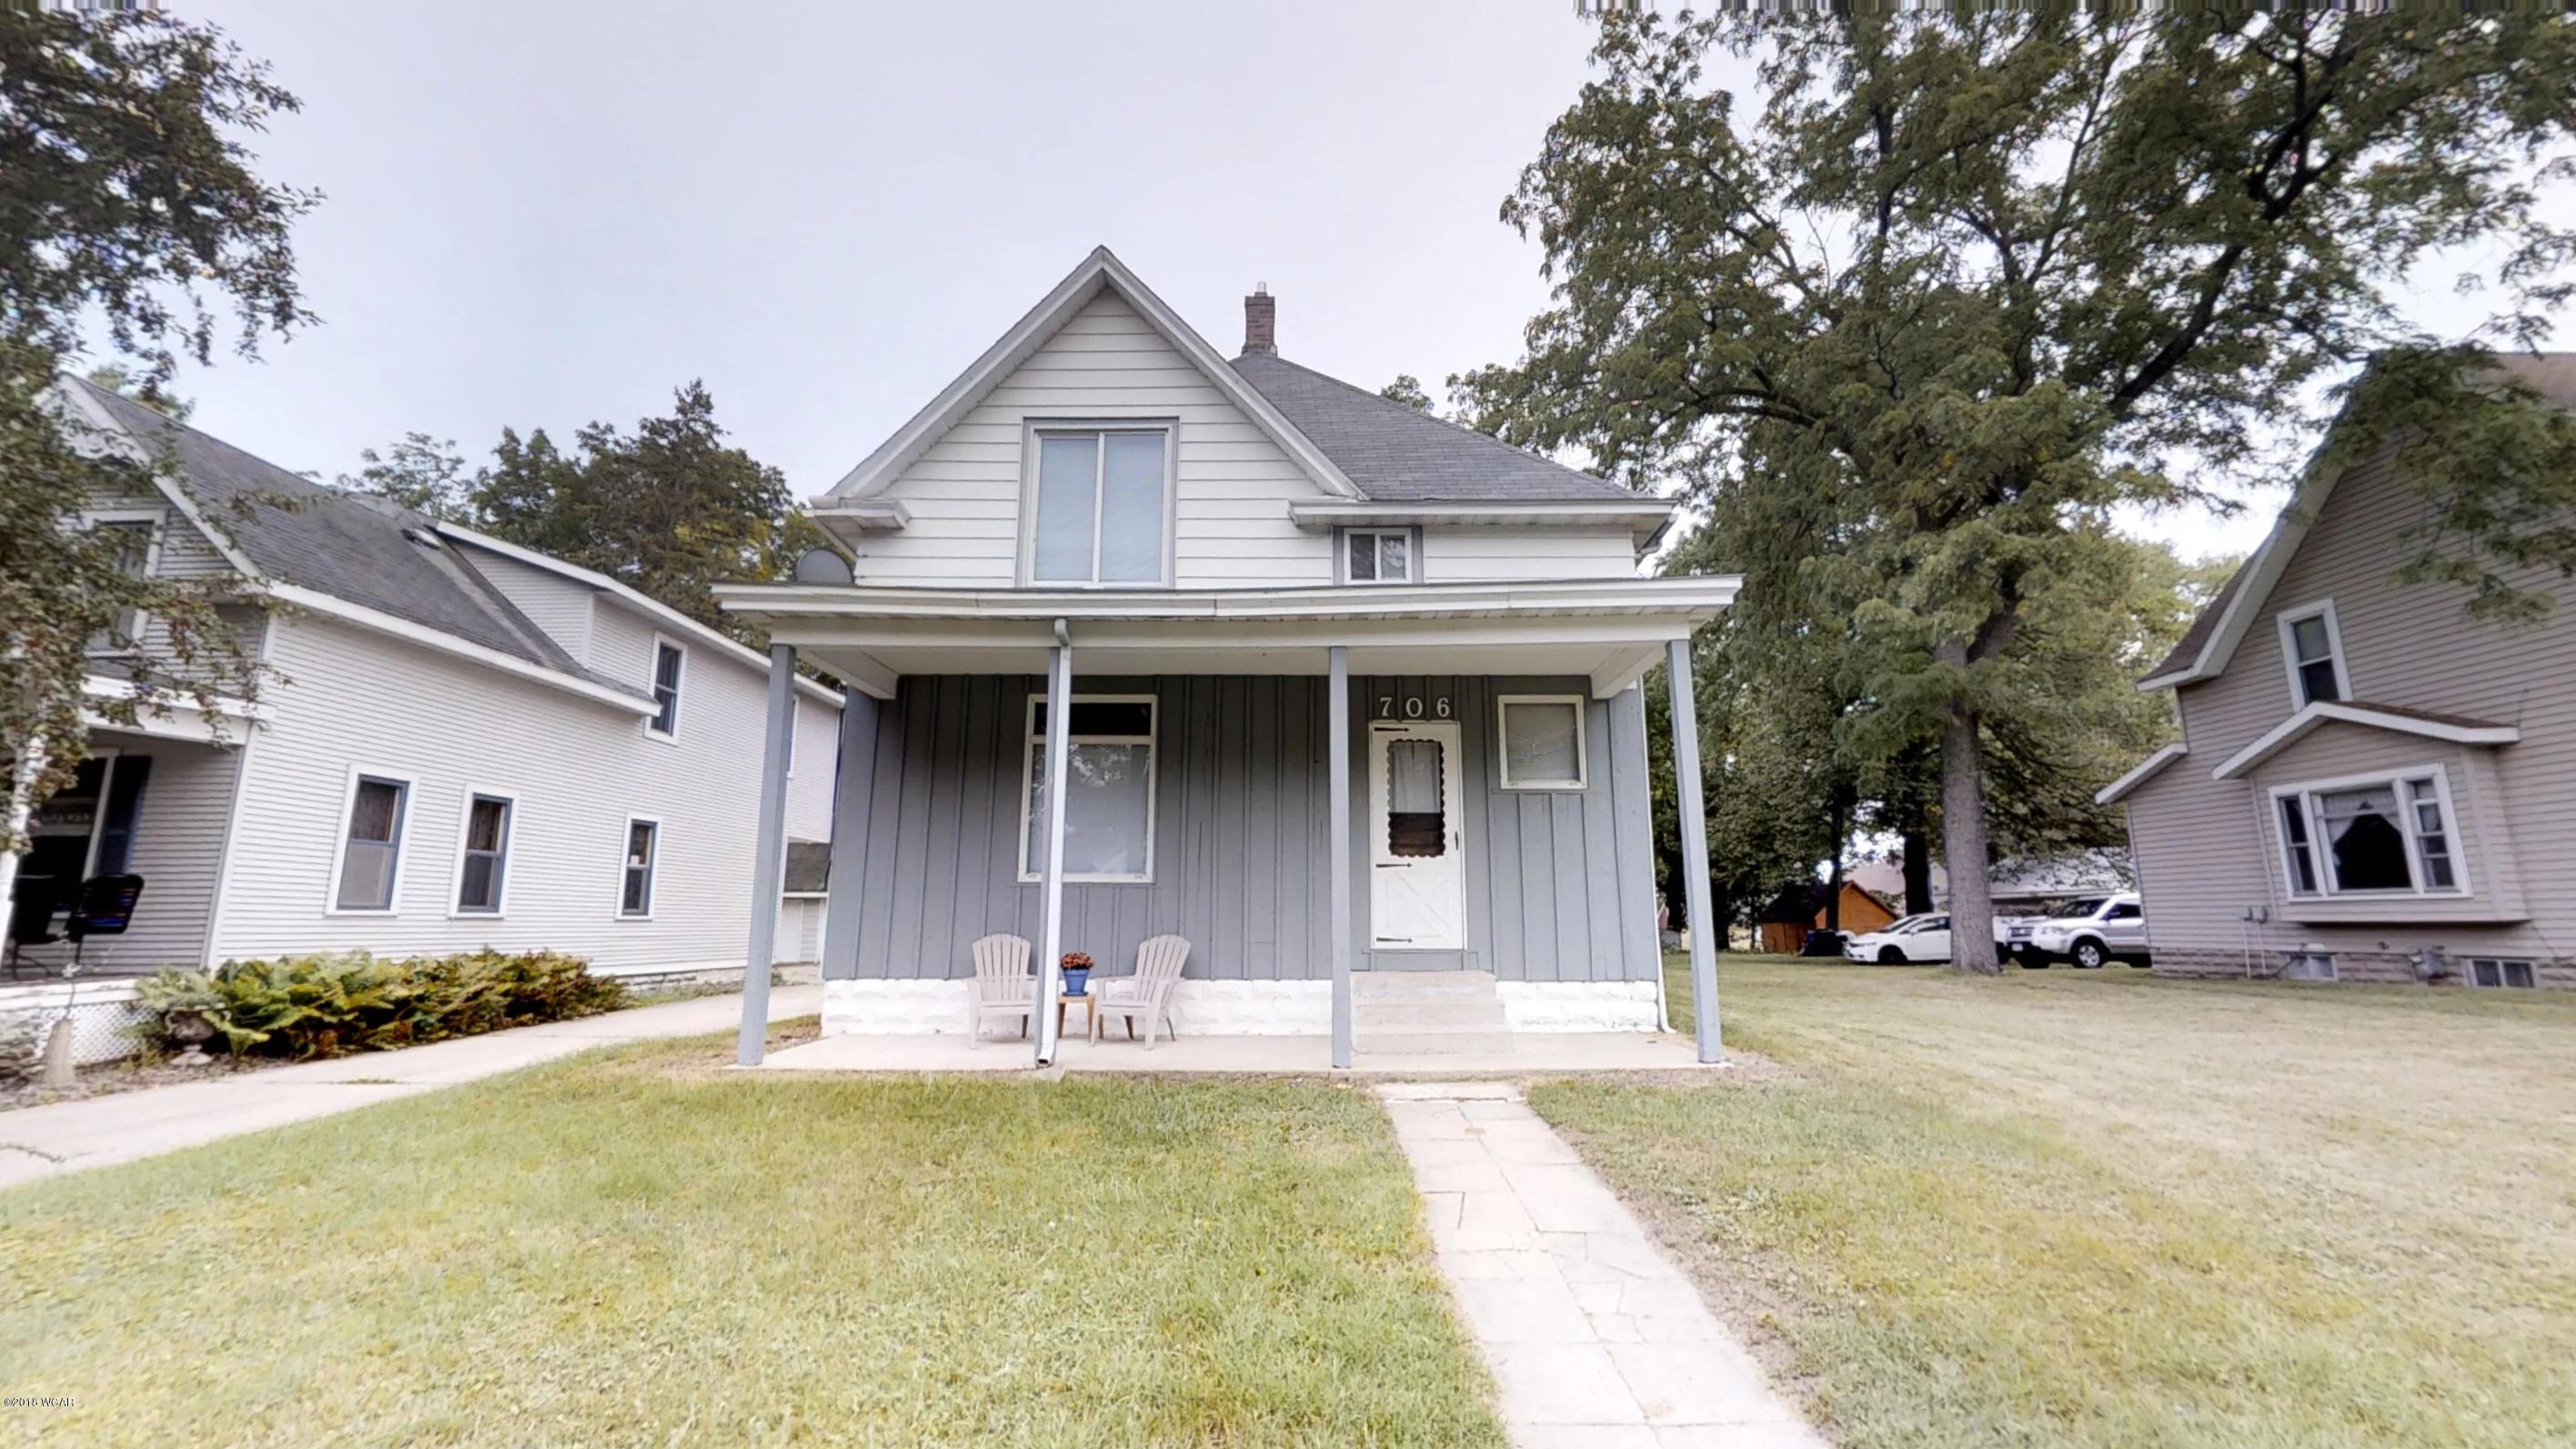 706 SE 3rd Street,Willmar,3 Bedrooms Bedrooms,2 BathroomsBathrooms,Single Family,SE 3rd Street,6032182